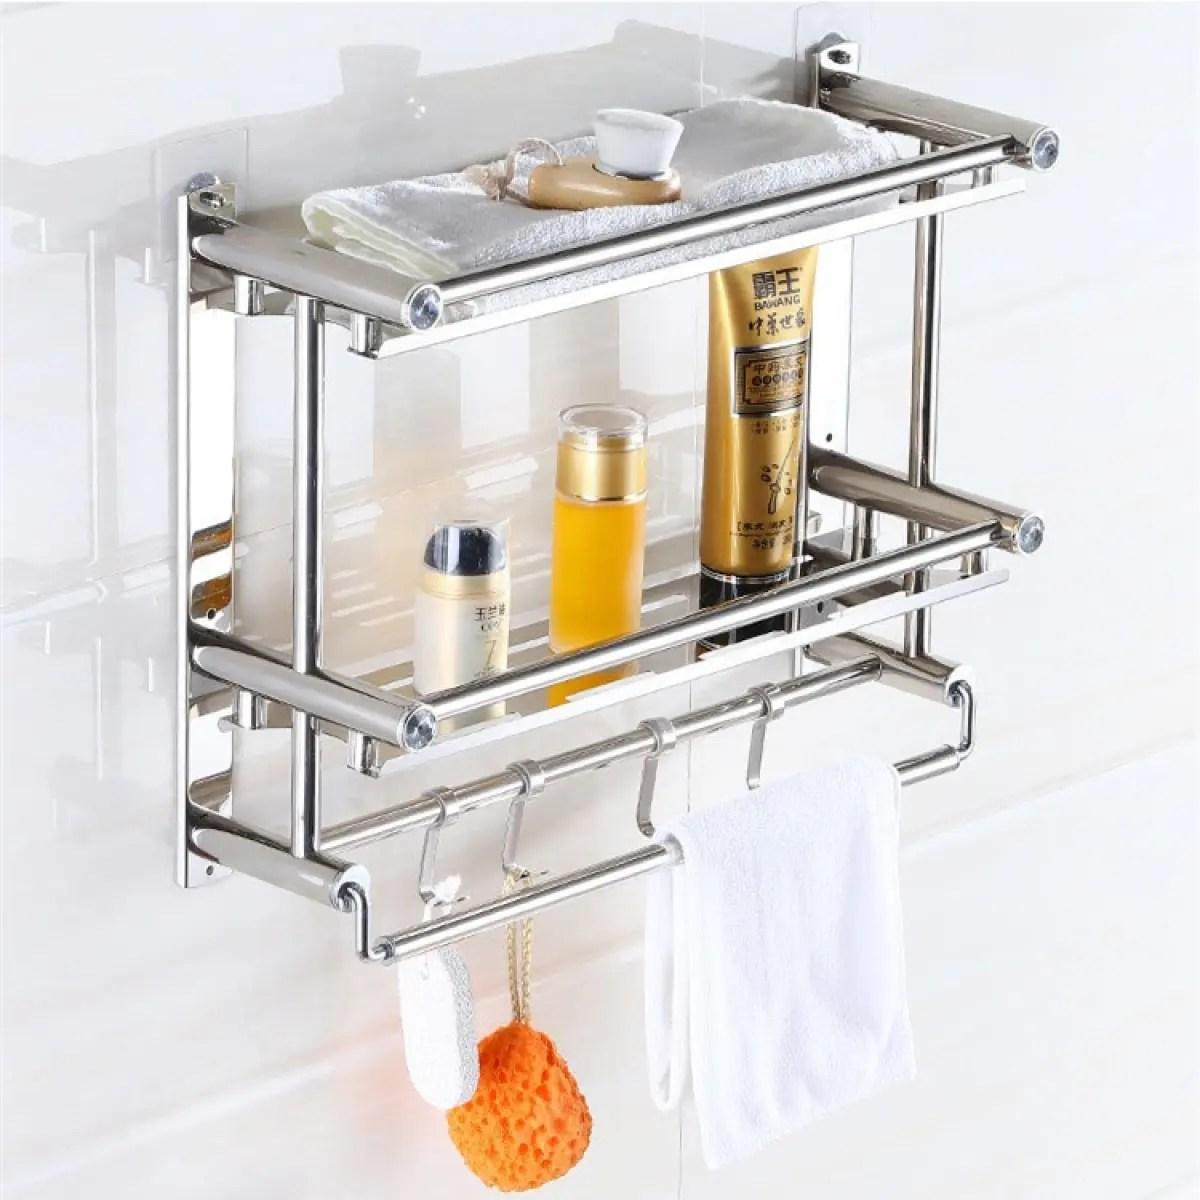 bathroom shelves 60cm stainless steel bathroom shelving shelf kitchen storage rack towel washcloth hanger bath 2 tier